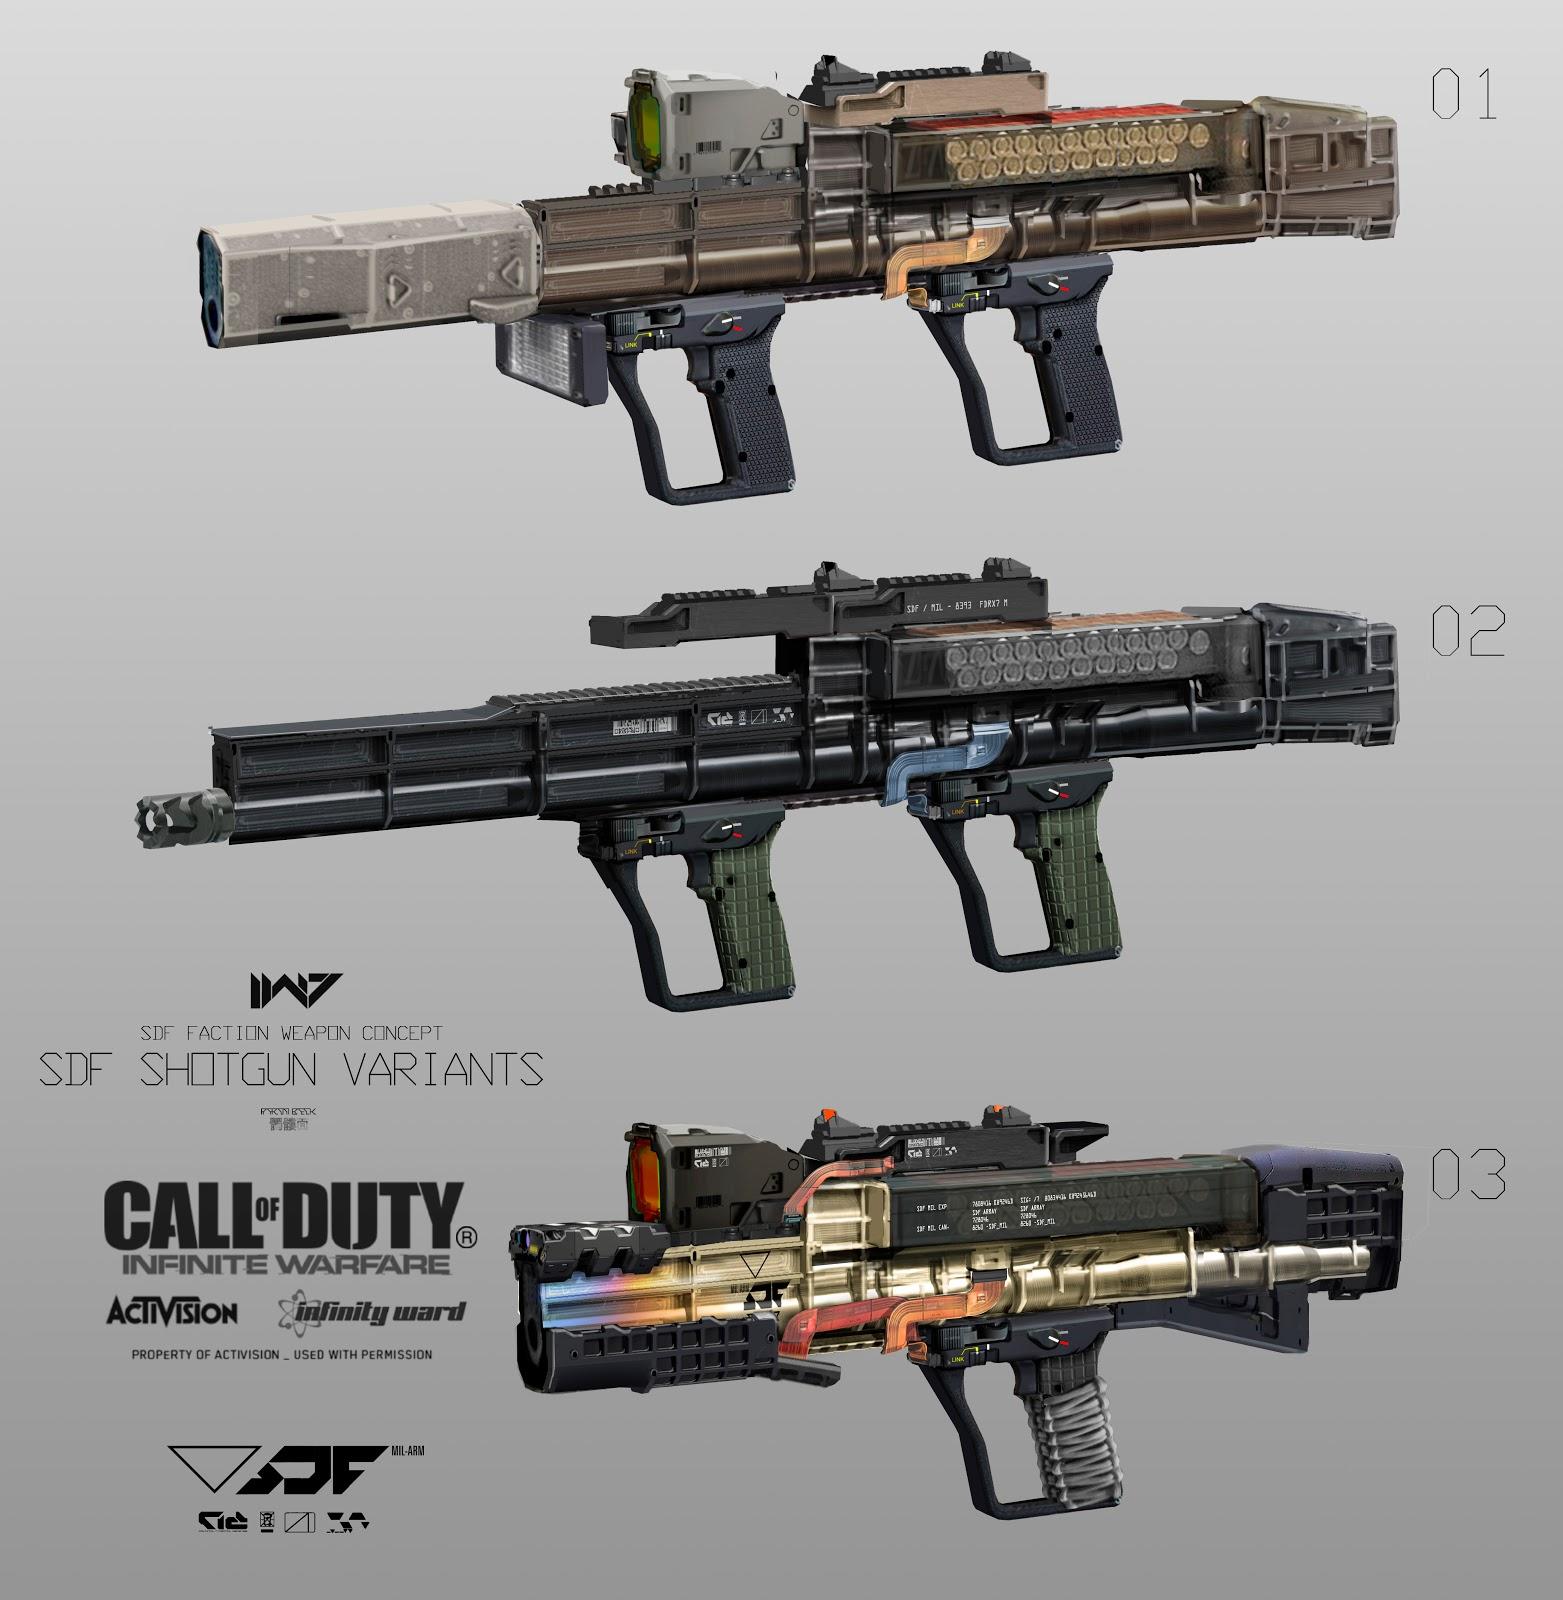 CODIW_SDF_shotgun_variants_02.jpg